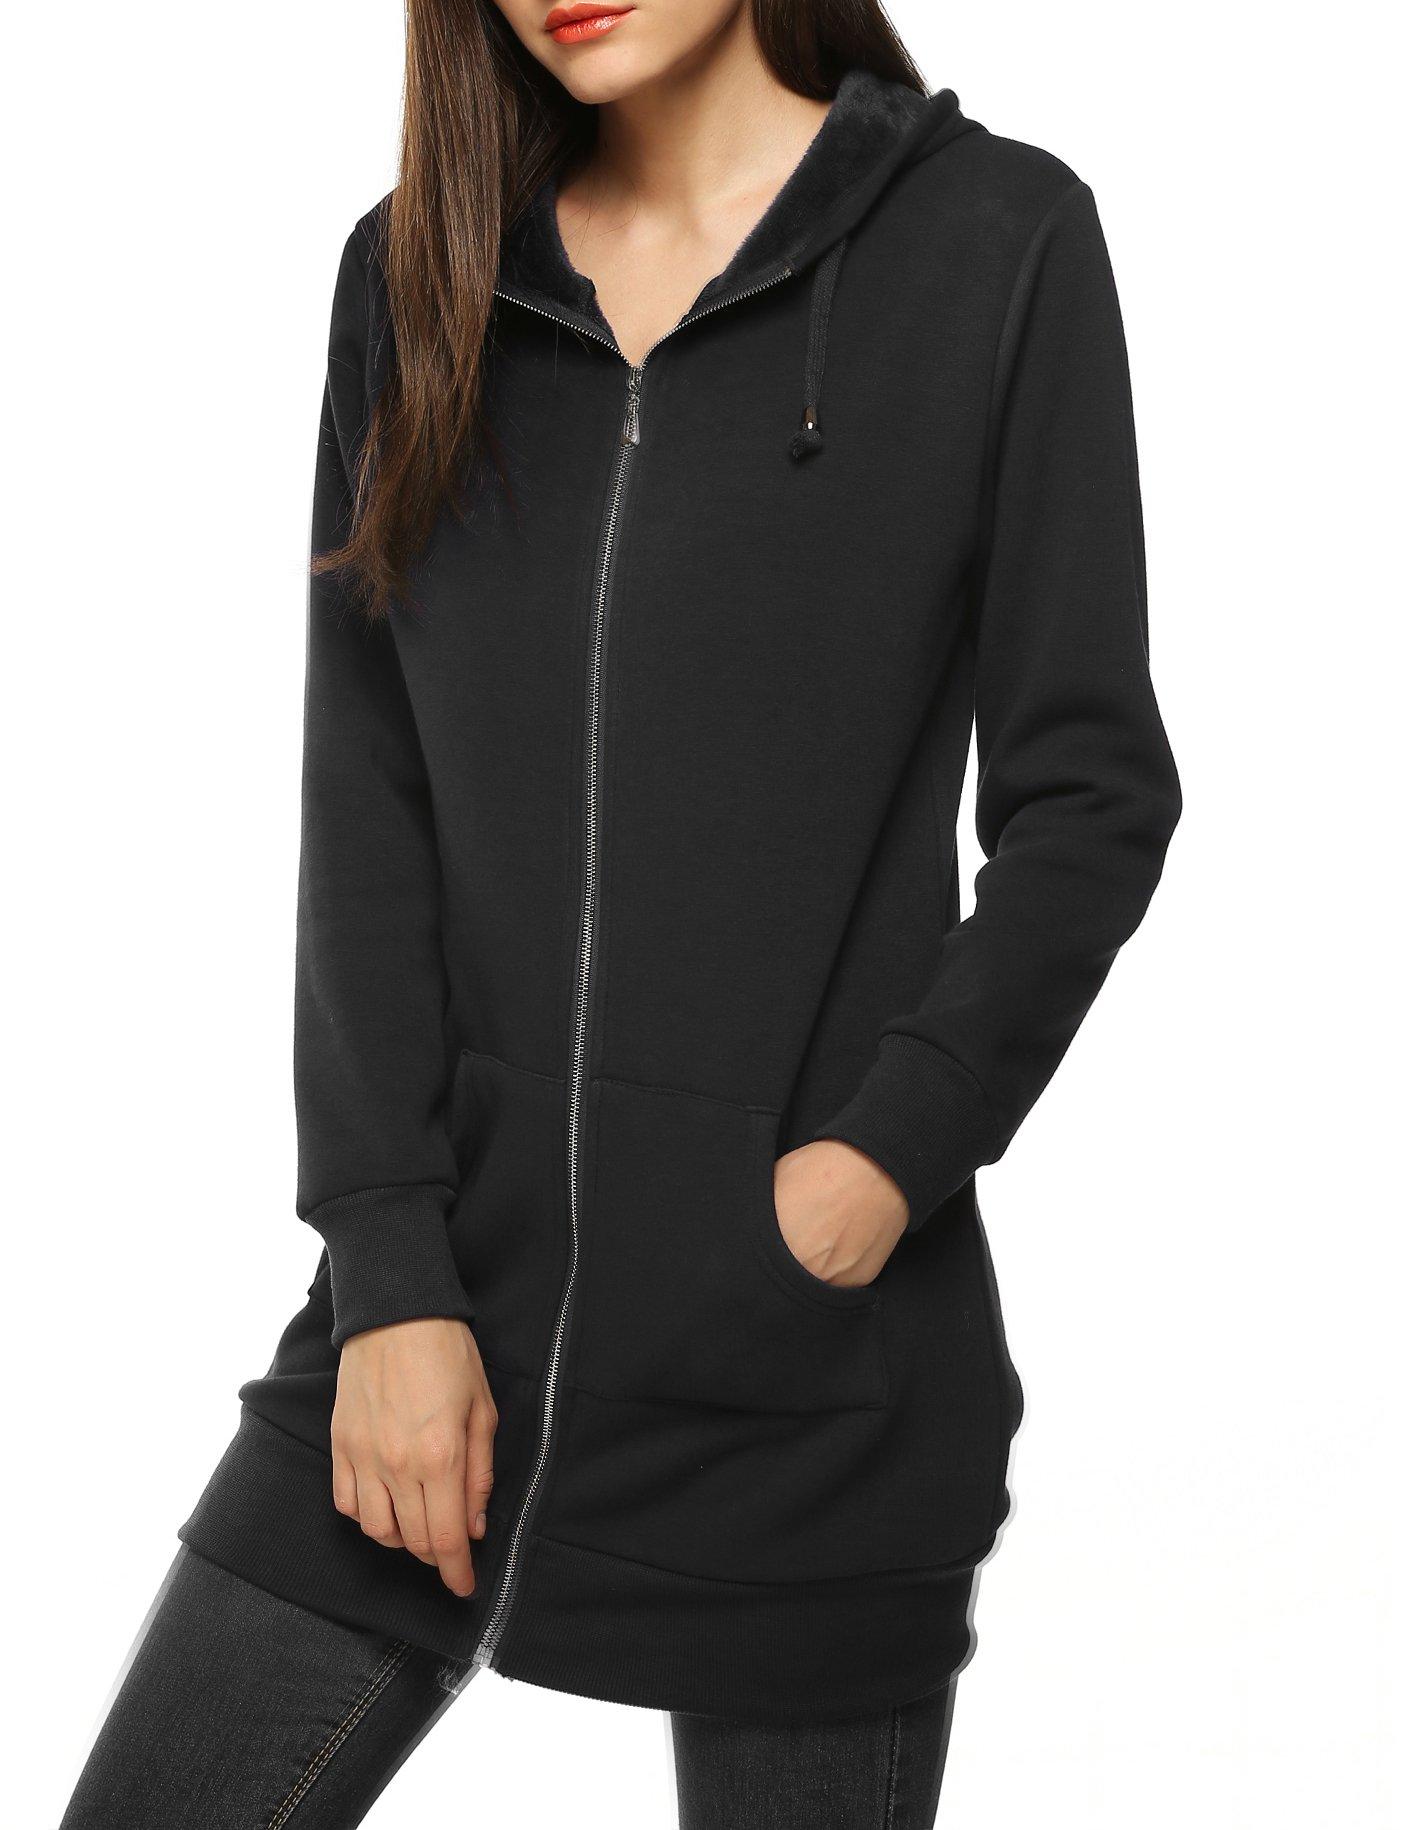 Zeagoo Women's Hooded Pullover Sweatshirt Casual Hoodie With Pockets,Black,Large